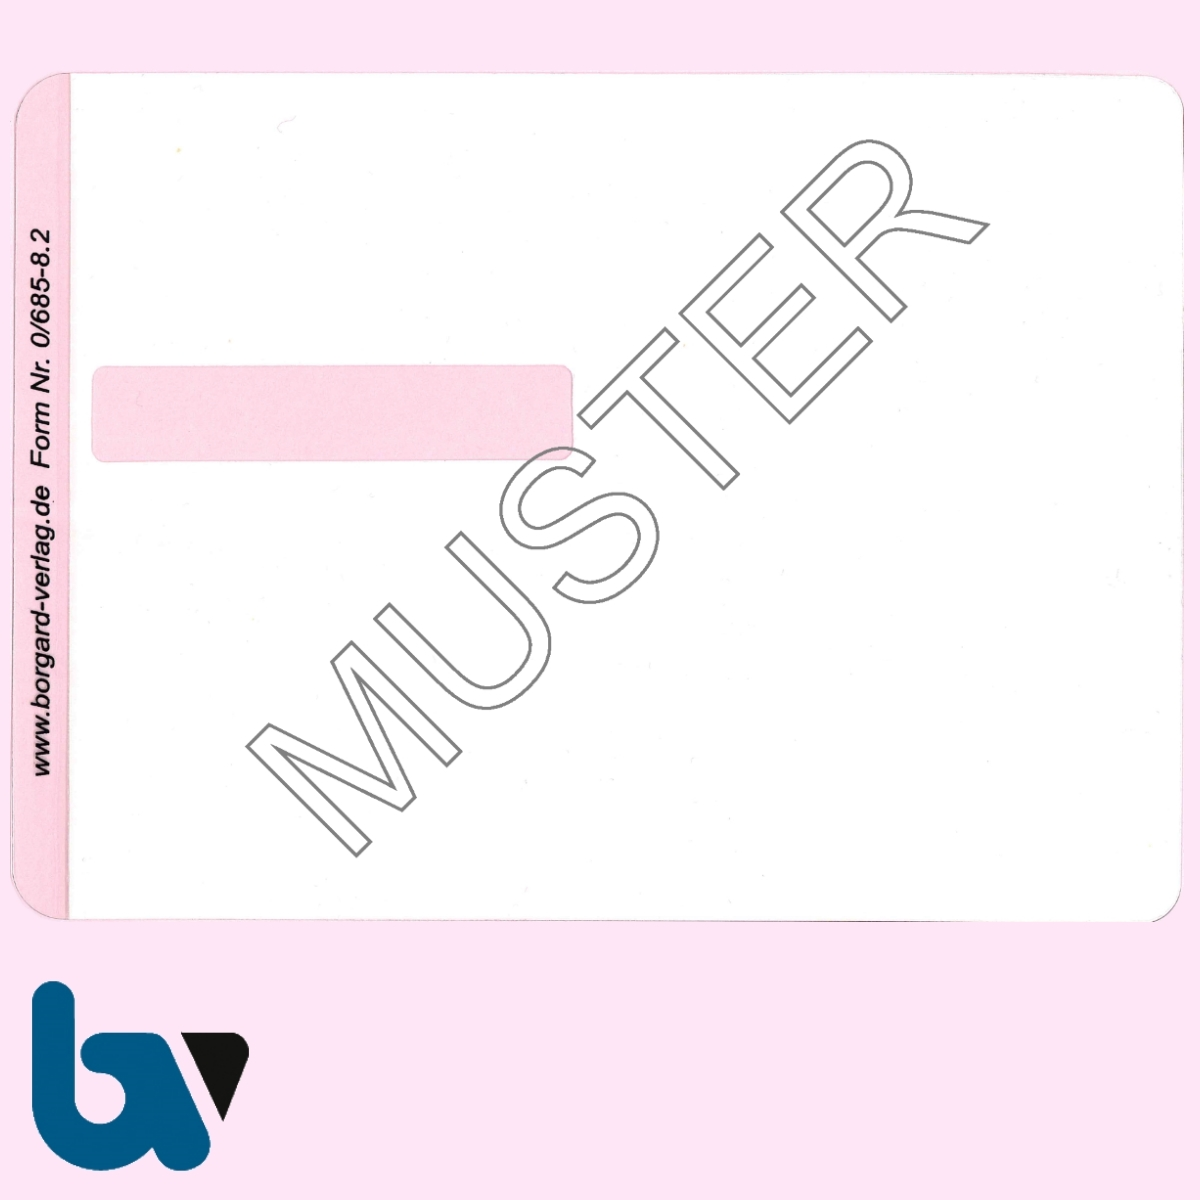 0/685-8.2 Klebefolie zur Plastifizierung mit Unterschriftfeld Parkausweis EU europäisch blau Modell behinderte Menschen leicht VS